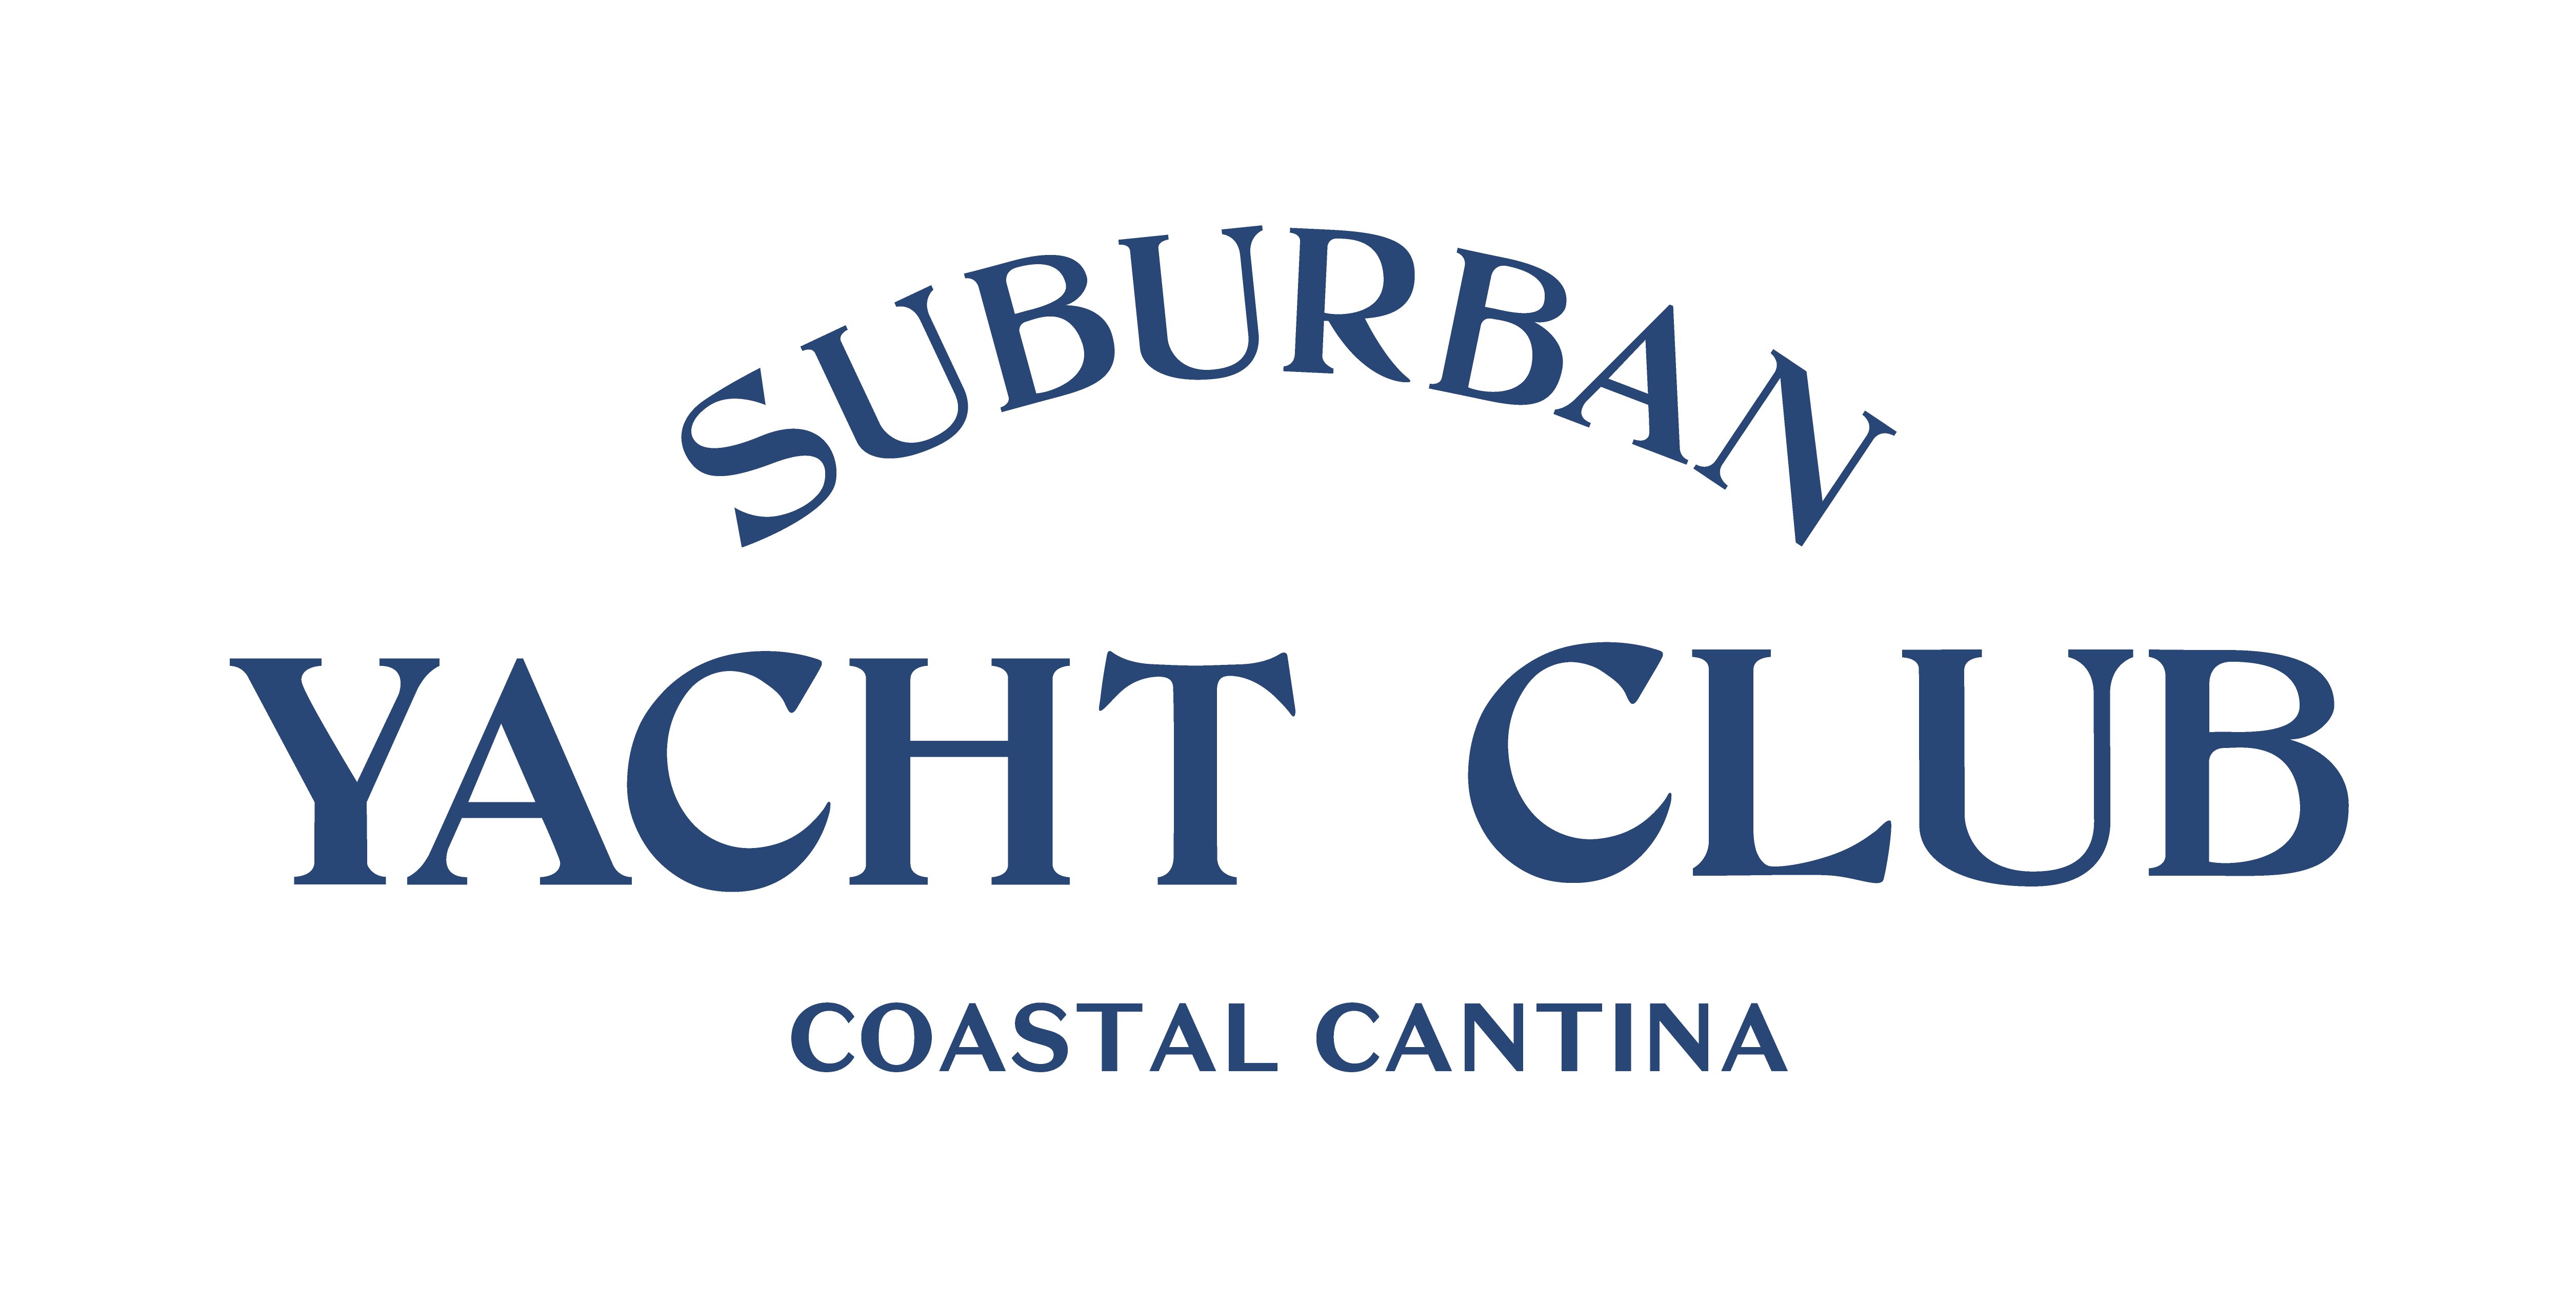 Suburban Yacht Club logo